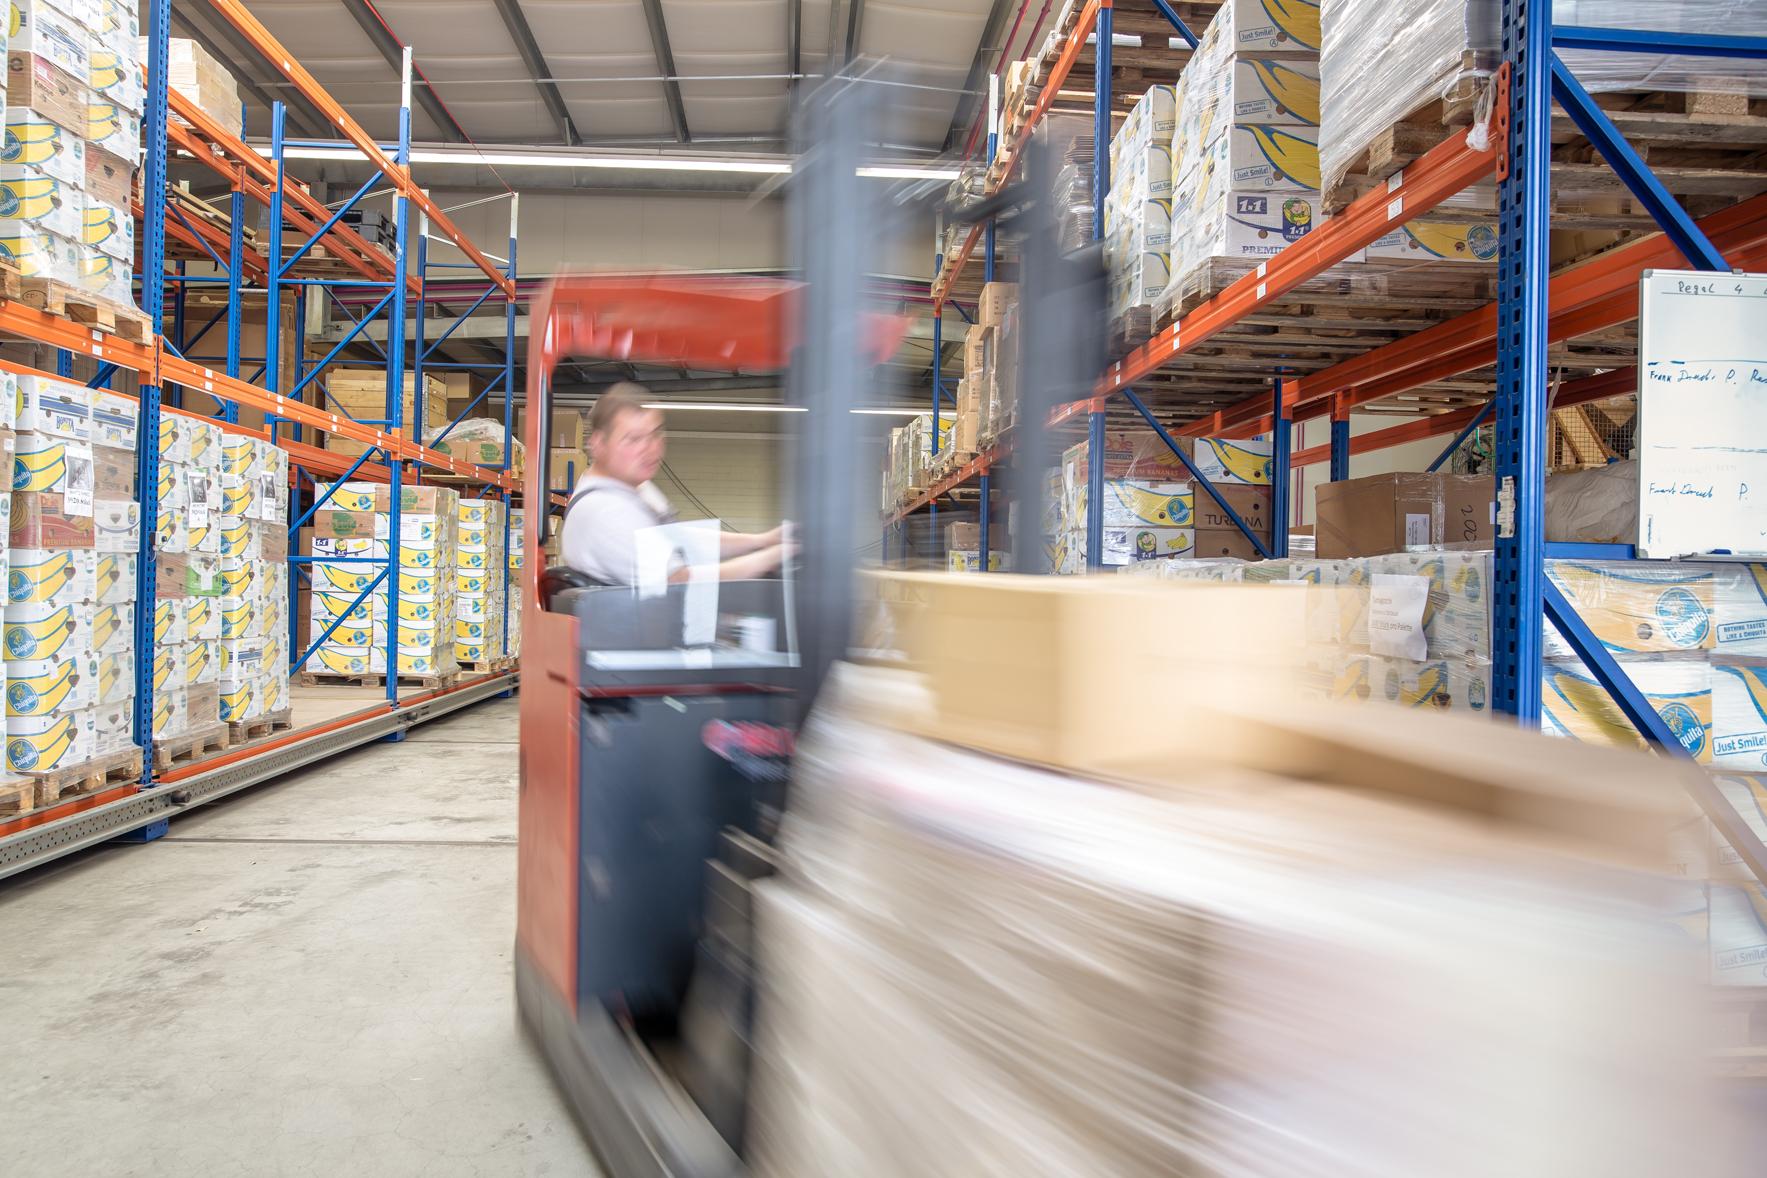 LHW-NMS - Arbeitsbereiche Logistik-9